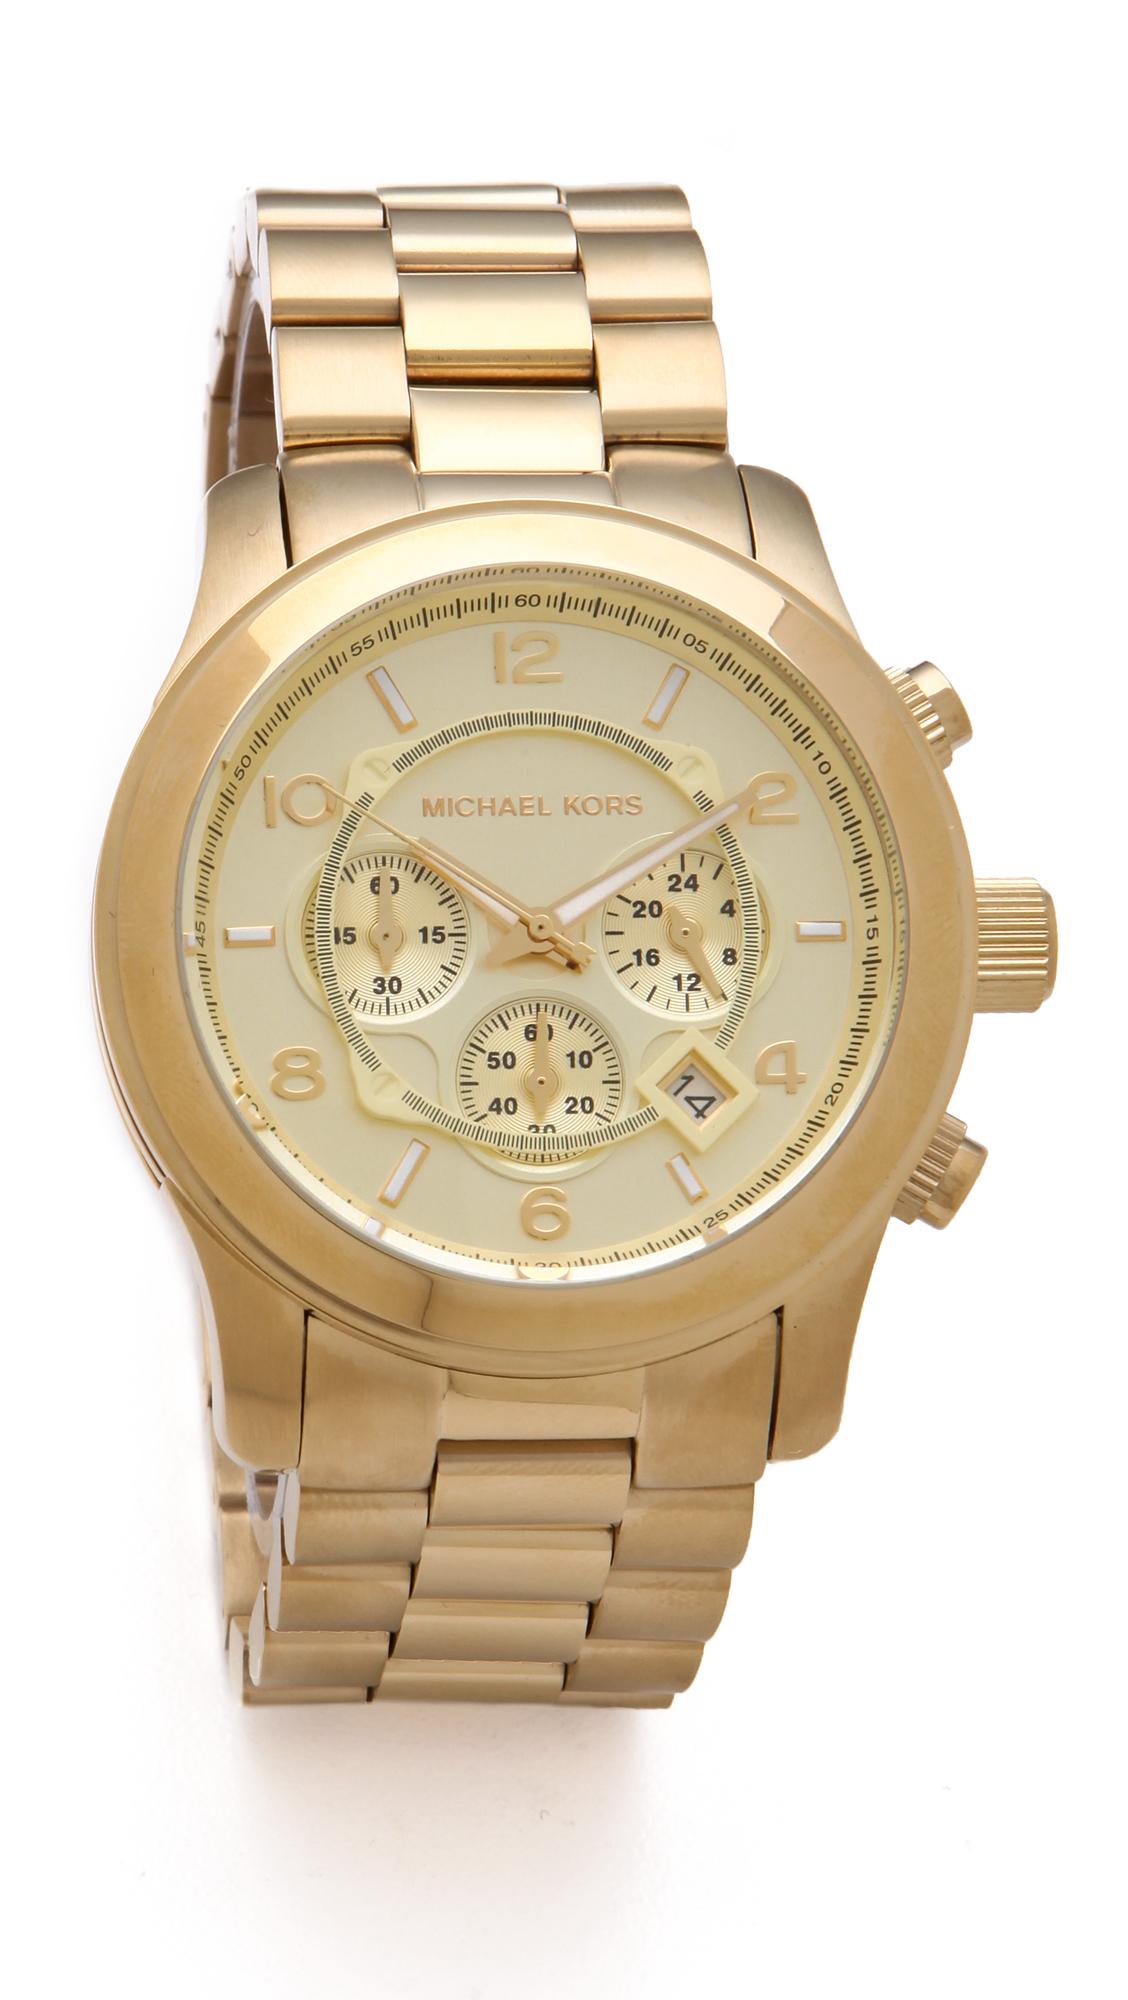 Michael kors часы oversized